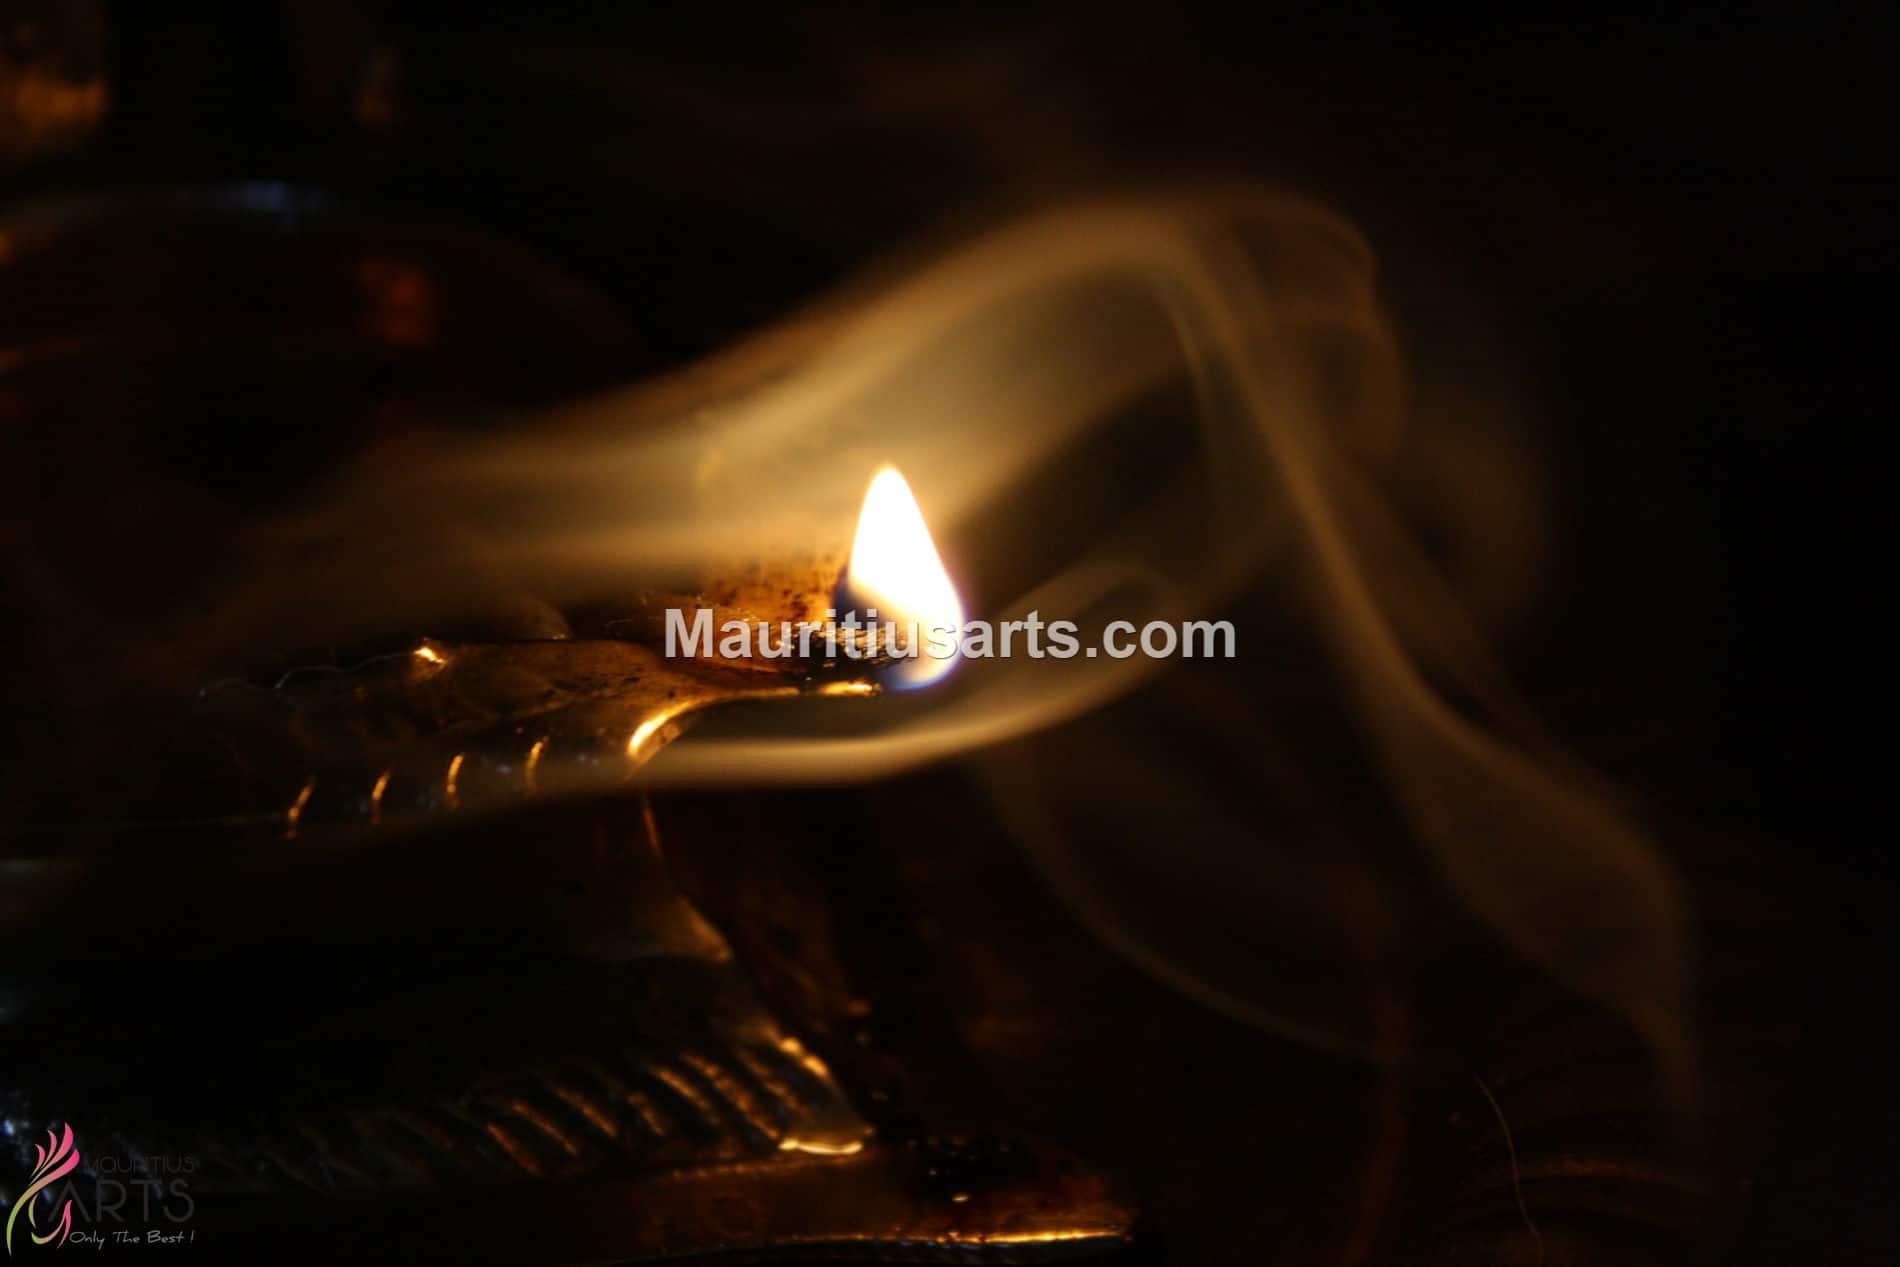 Mauritius Arts & Artists - Shivagaami-Lutchmanen-Lalimier